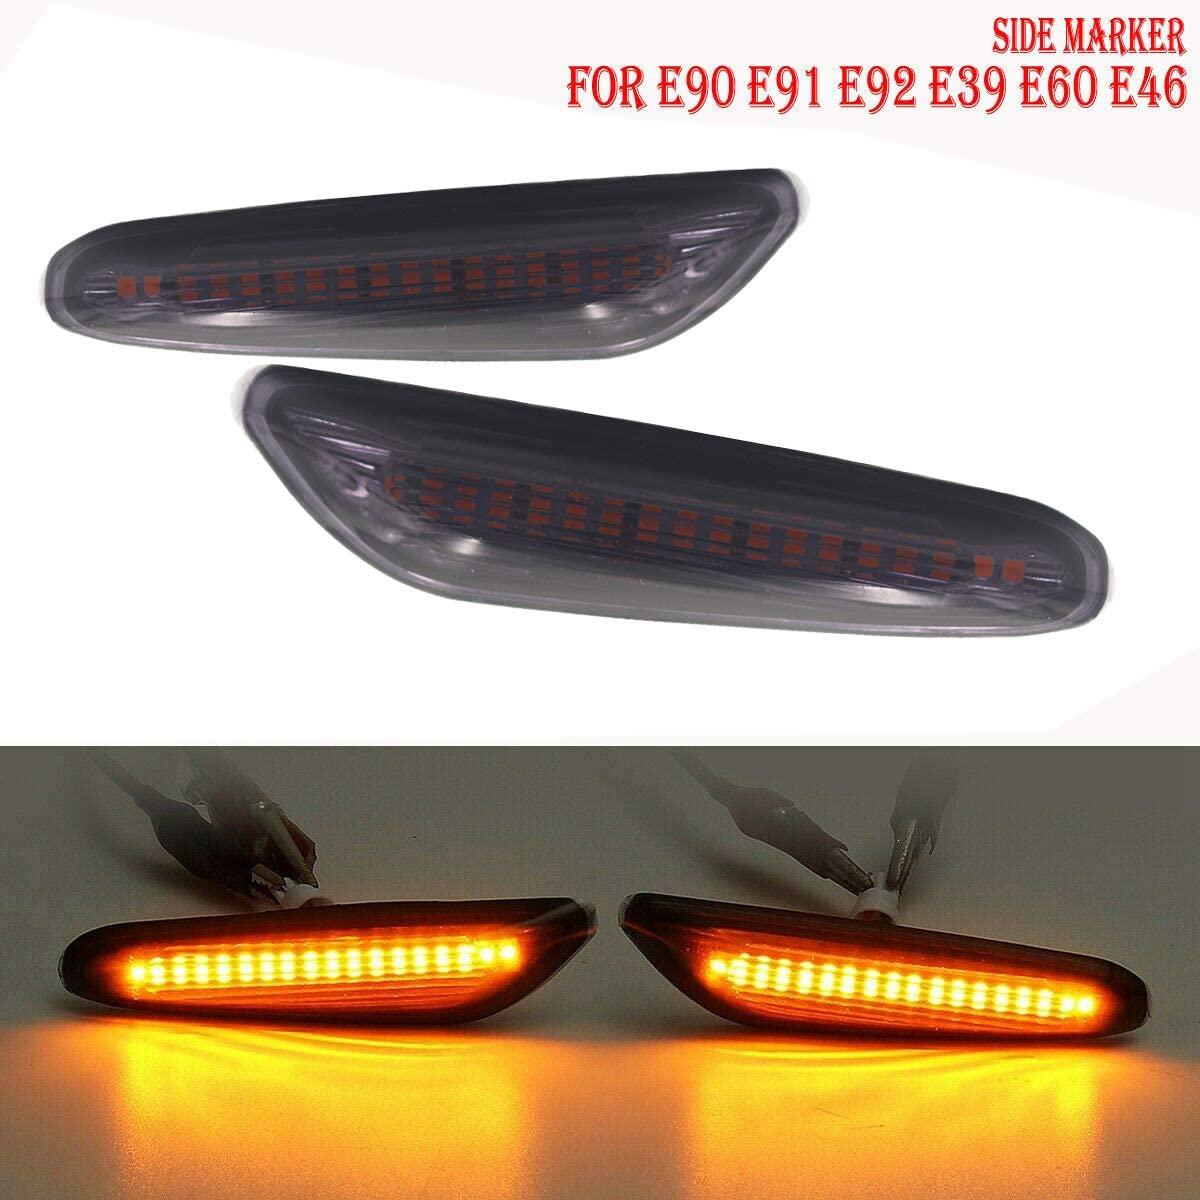 GSRECY Smoke Lens Amber LED Side Marker Turn Signal Light For BMW E90 E91 E92 E93 E46 E53 X3 E83 X 1 E84 E81 E82 E87 E88